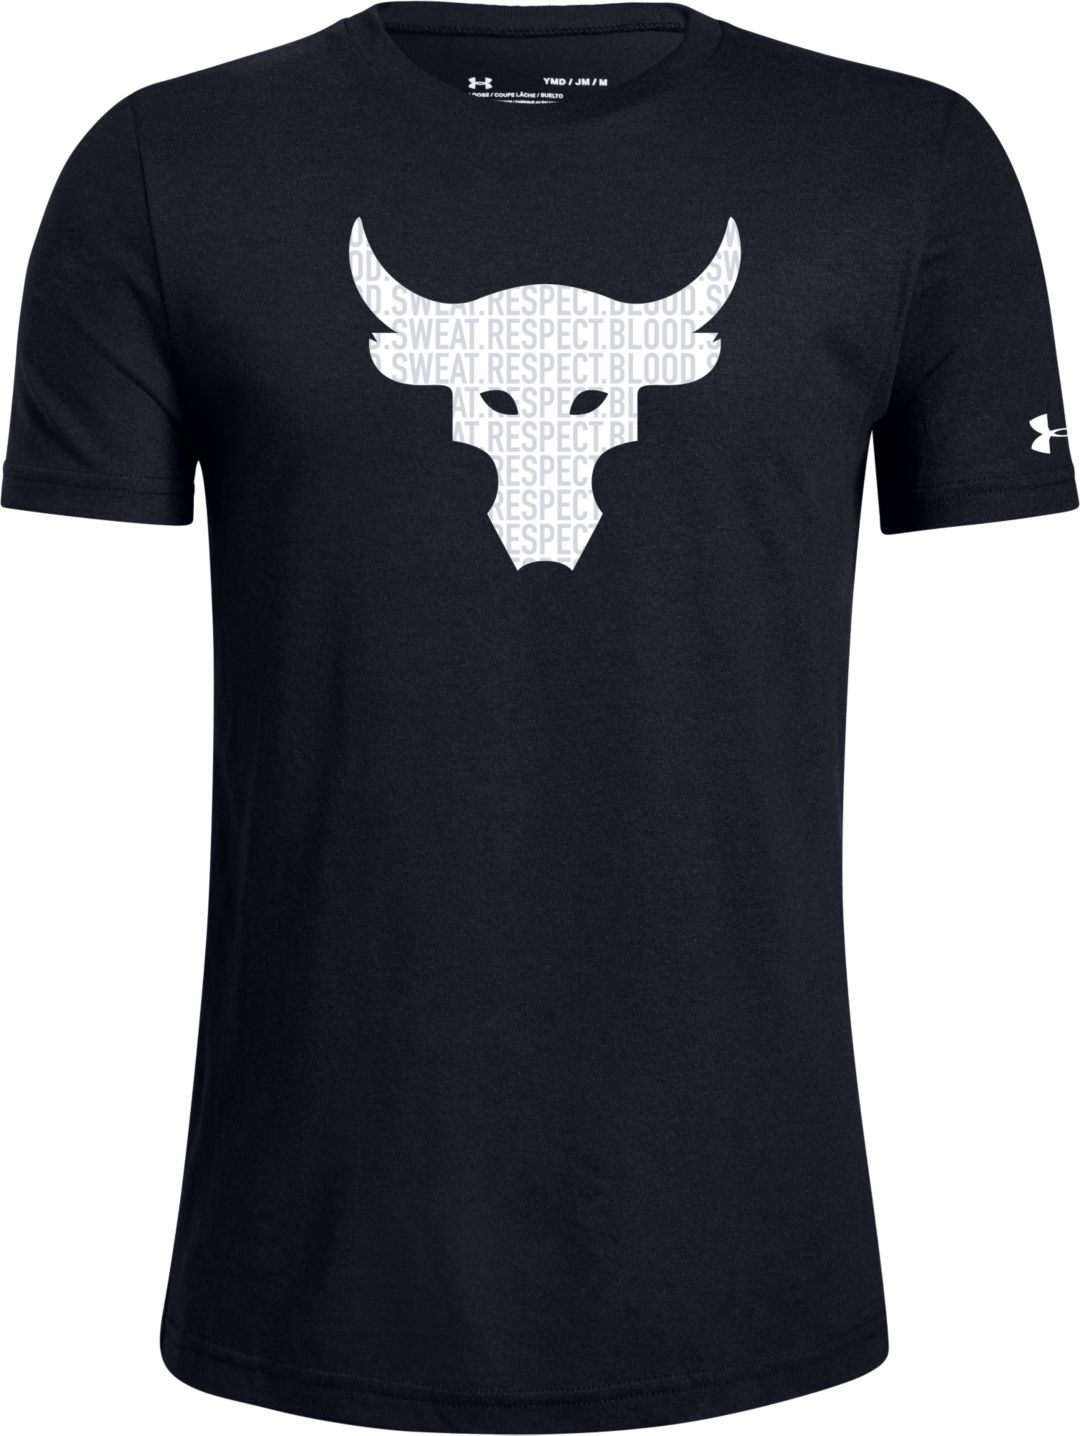 exquisite craftsmanship enjoy discount price convenience goods Under Armour Boys' Project Rock Brahma Bull Graphic T-Shirt